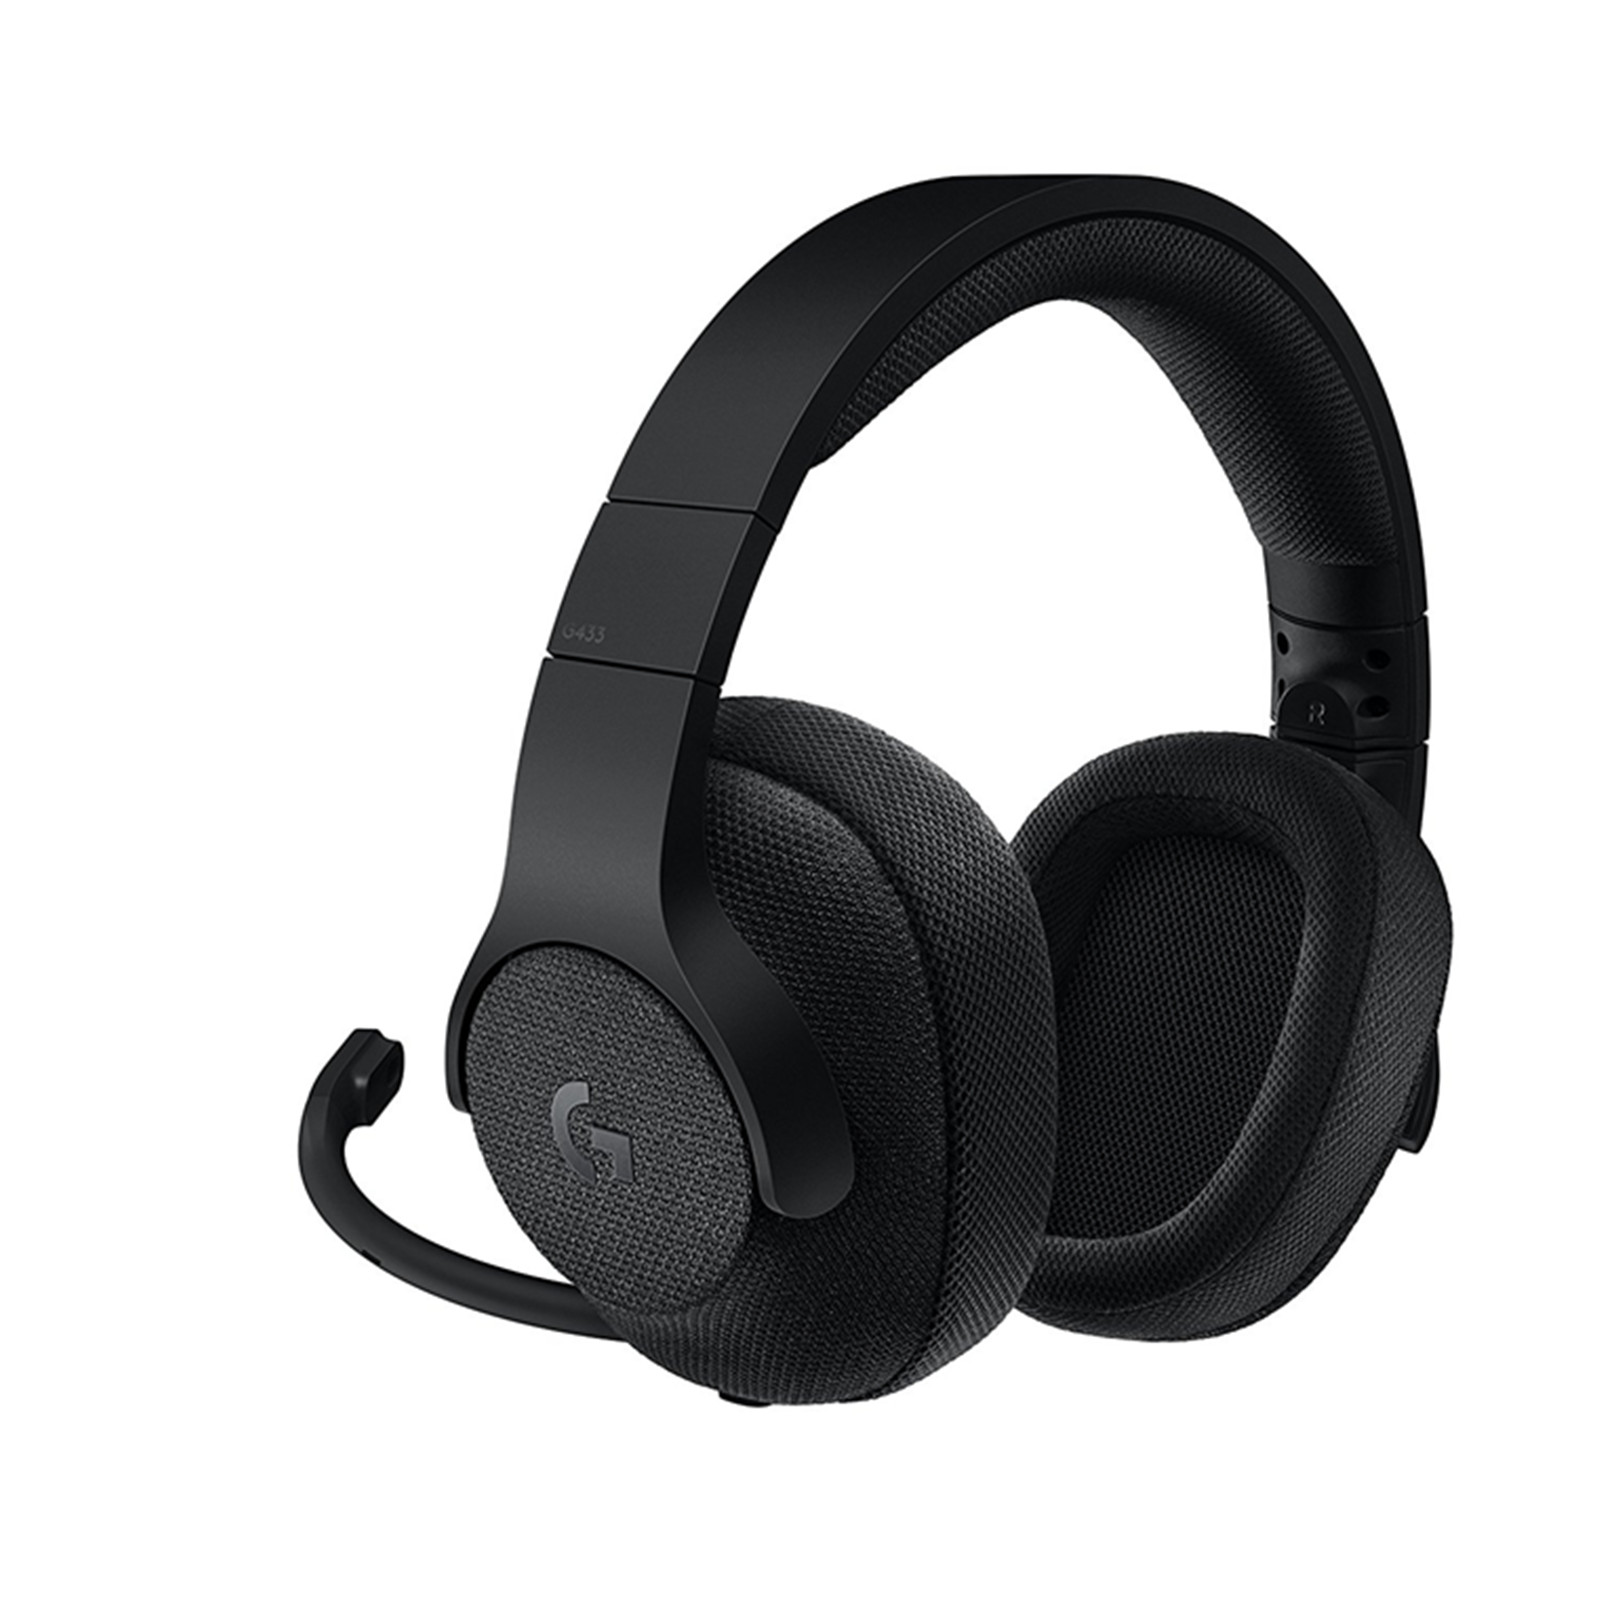 Buy the Logitech G433 7 1 Surround Sound USB Gaming Headset